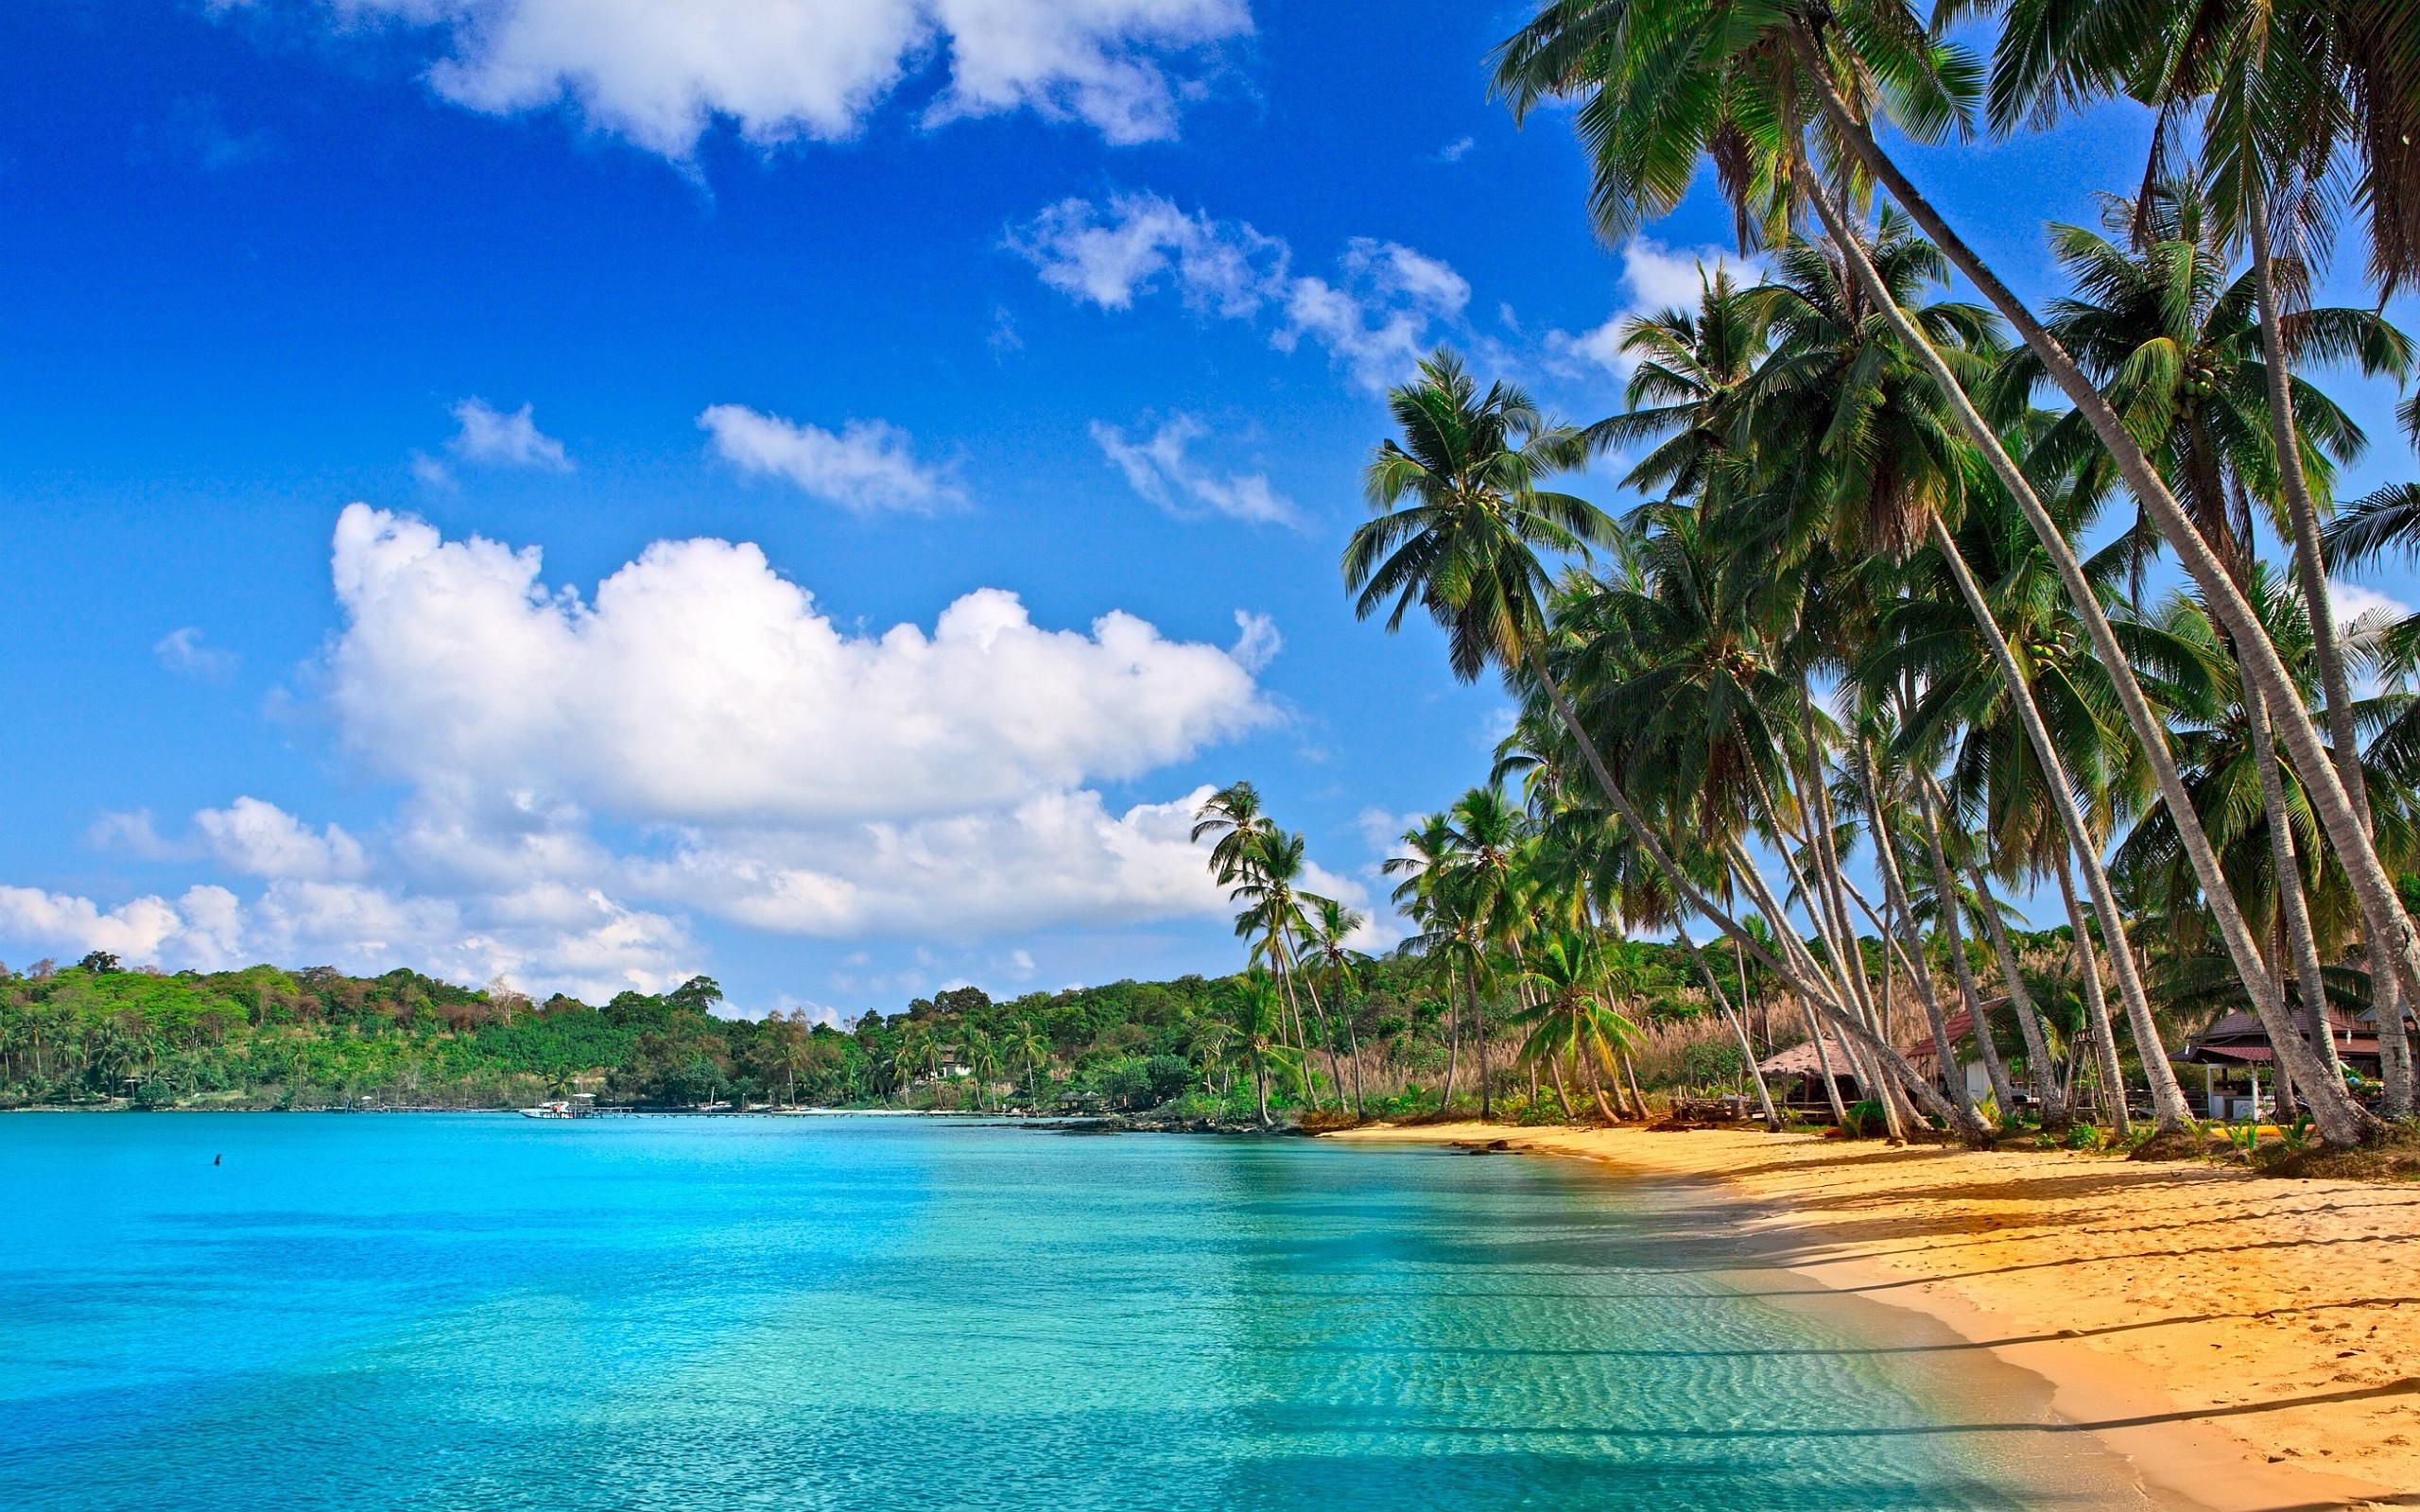 Nature wallpaper · tropical beach wallpapers hd